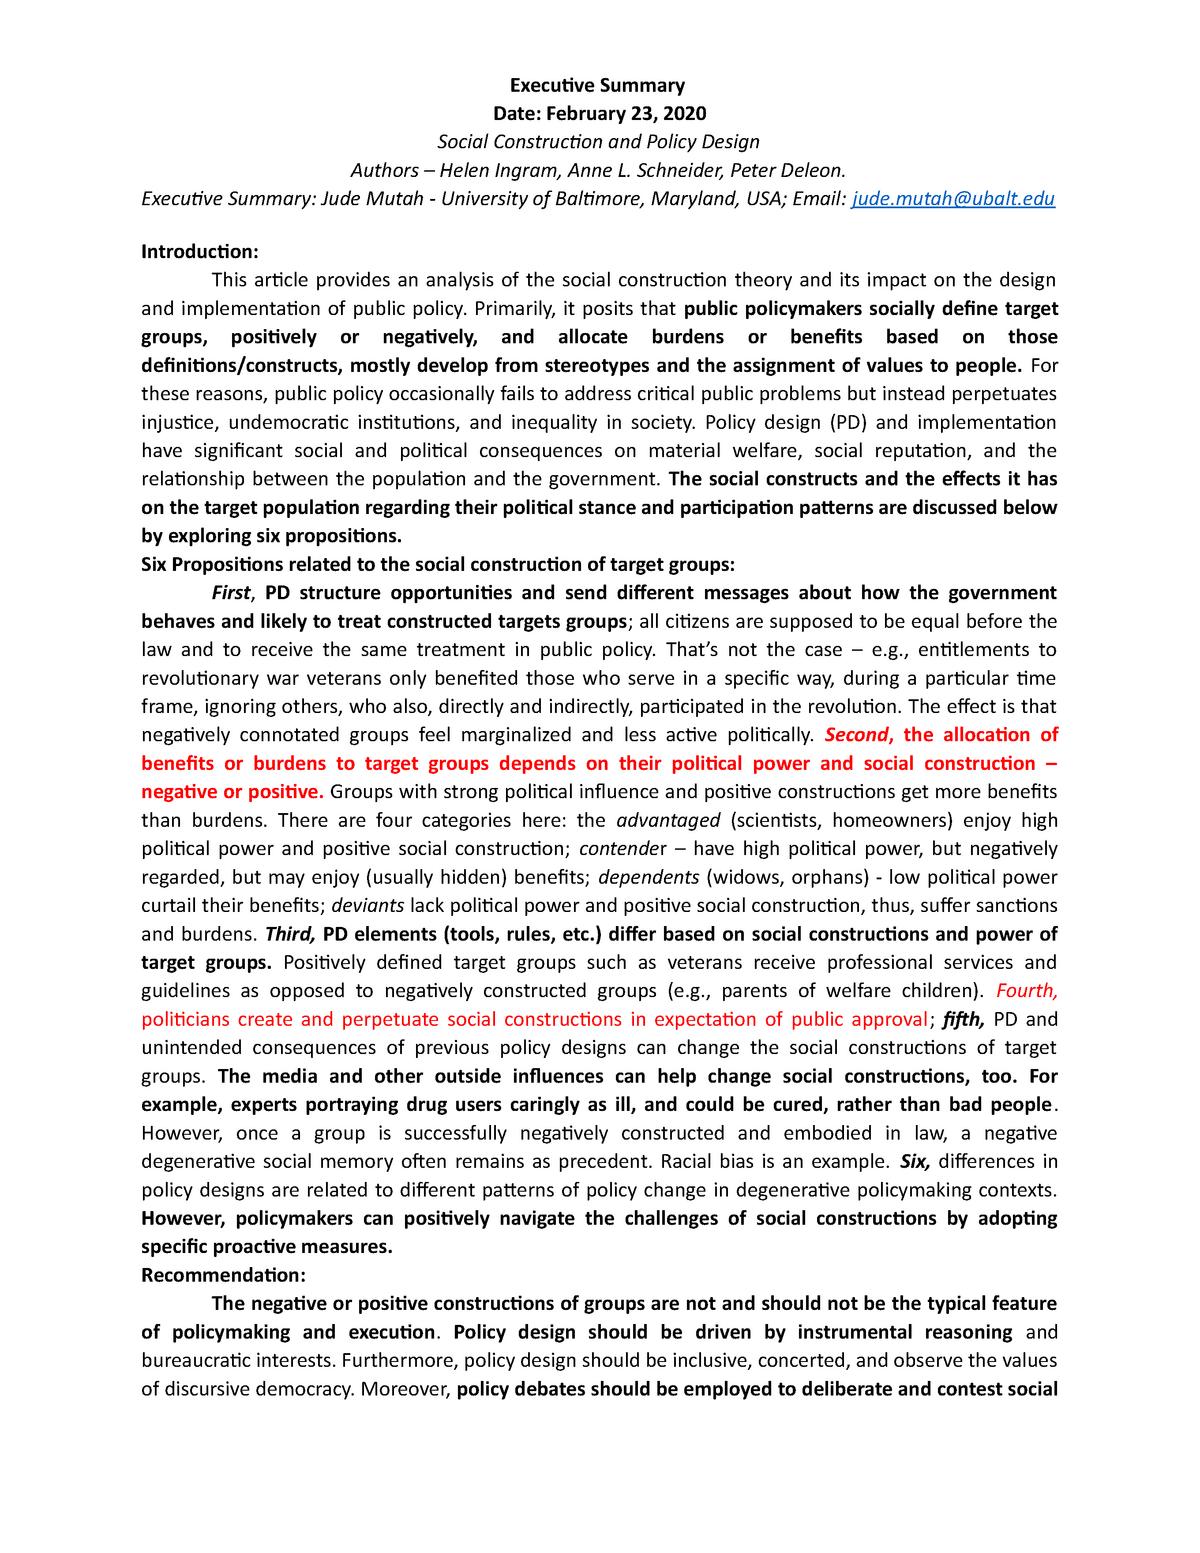 Executive Summary 2 Ingram Schneider Deleon Pad 6865 Studocu